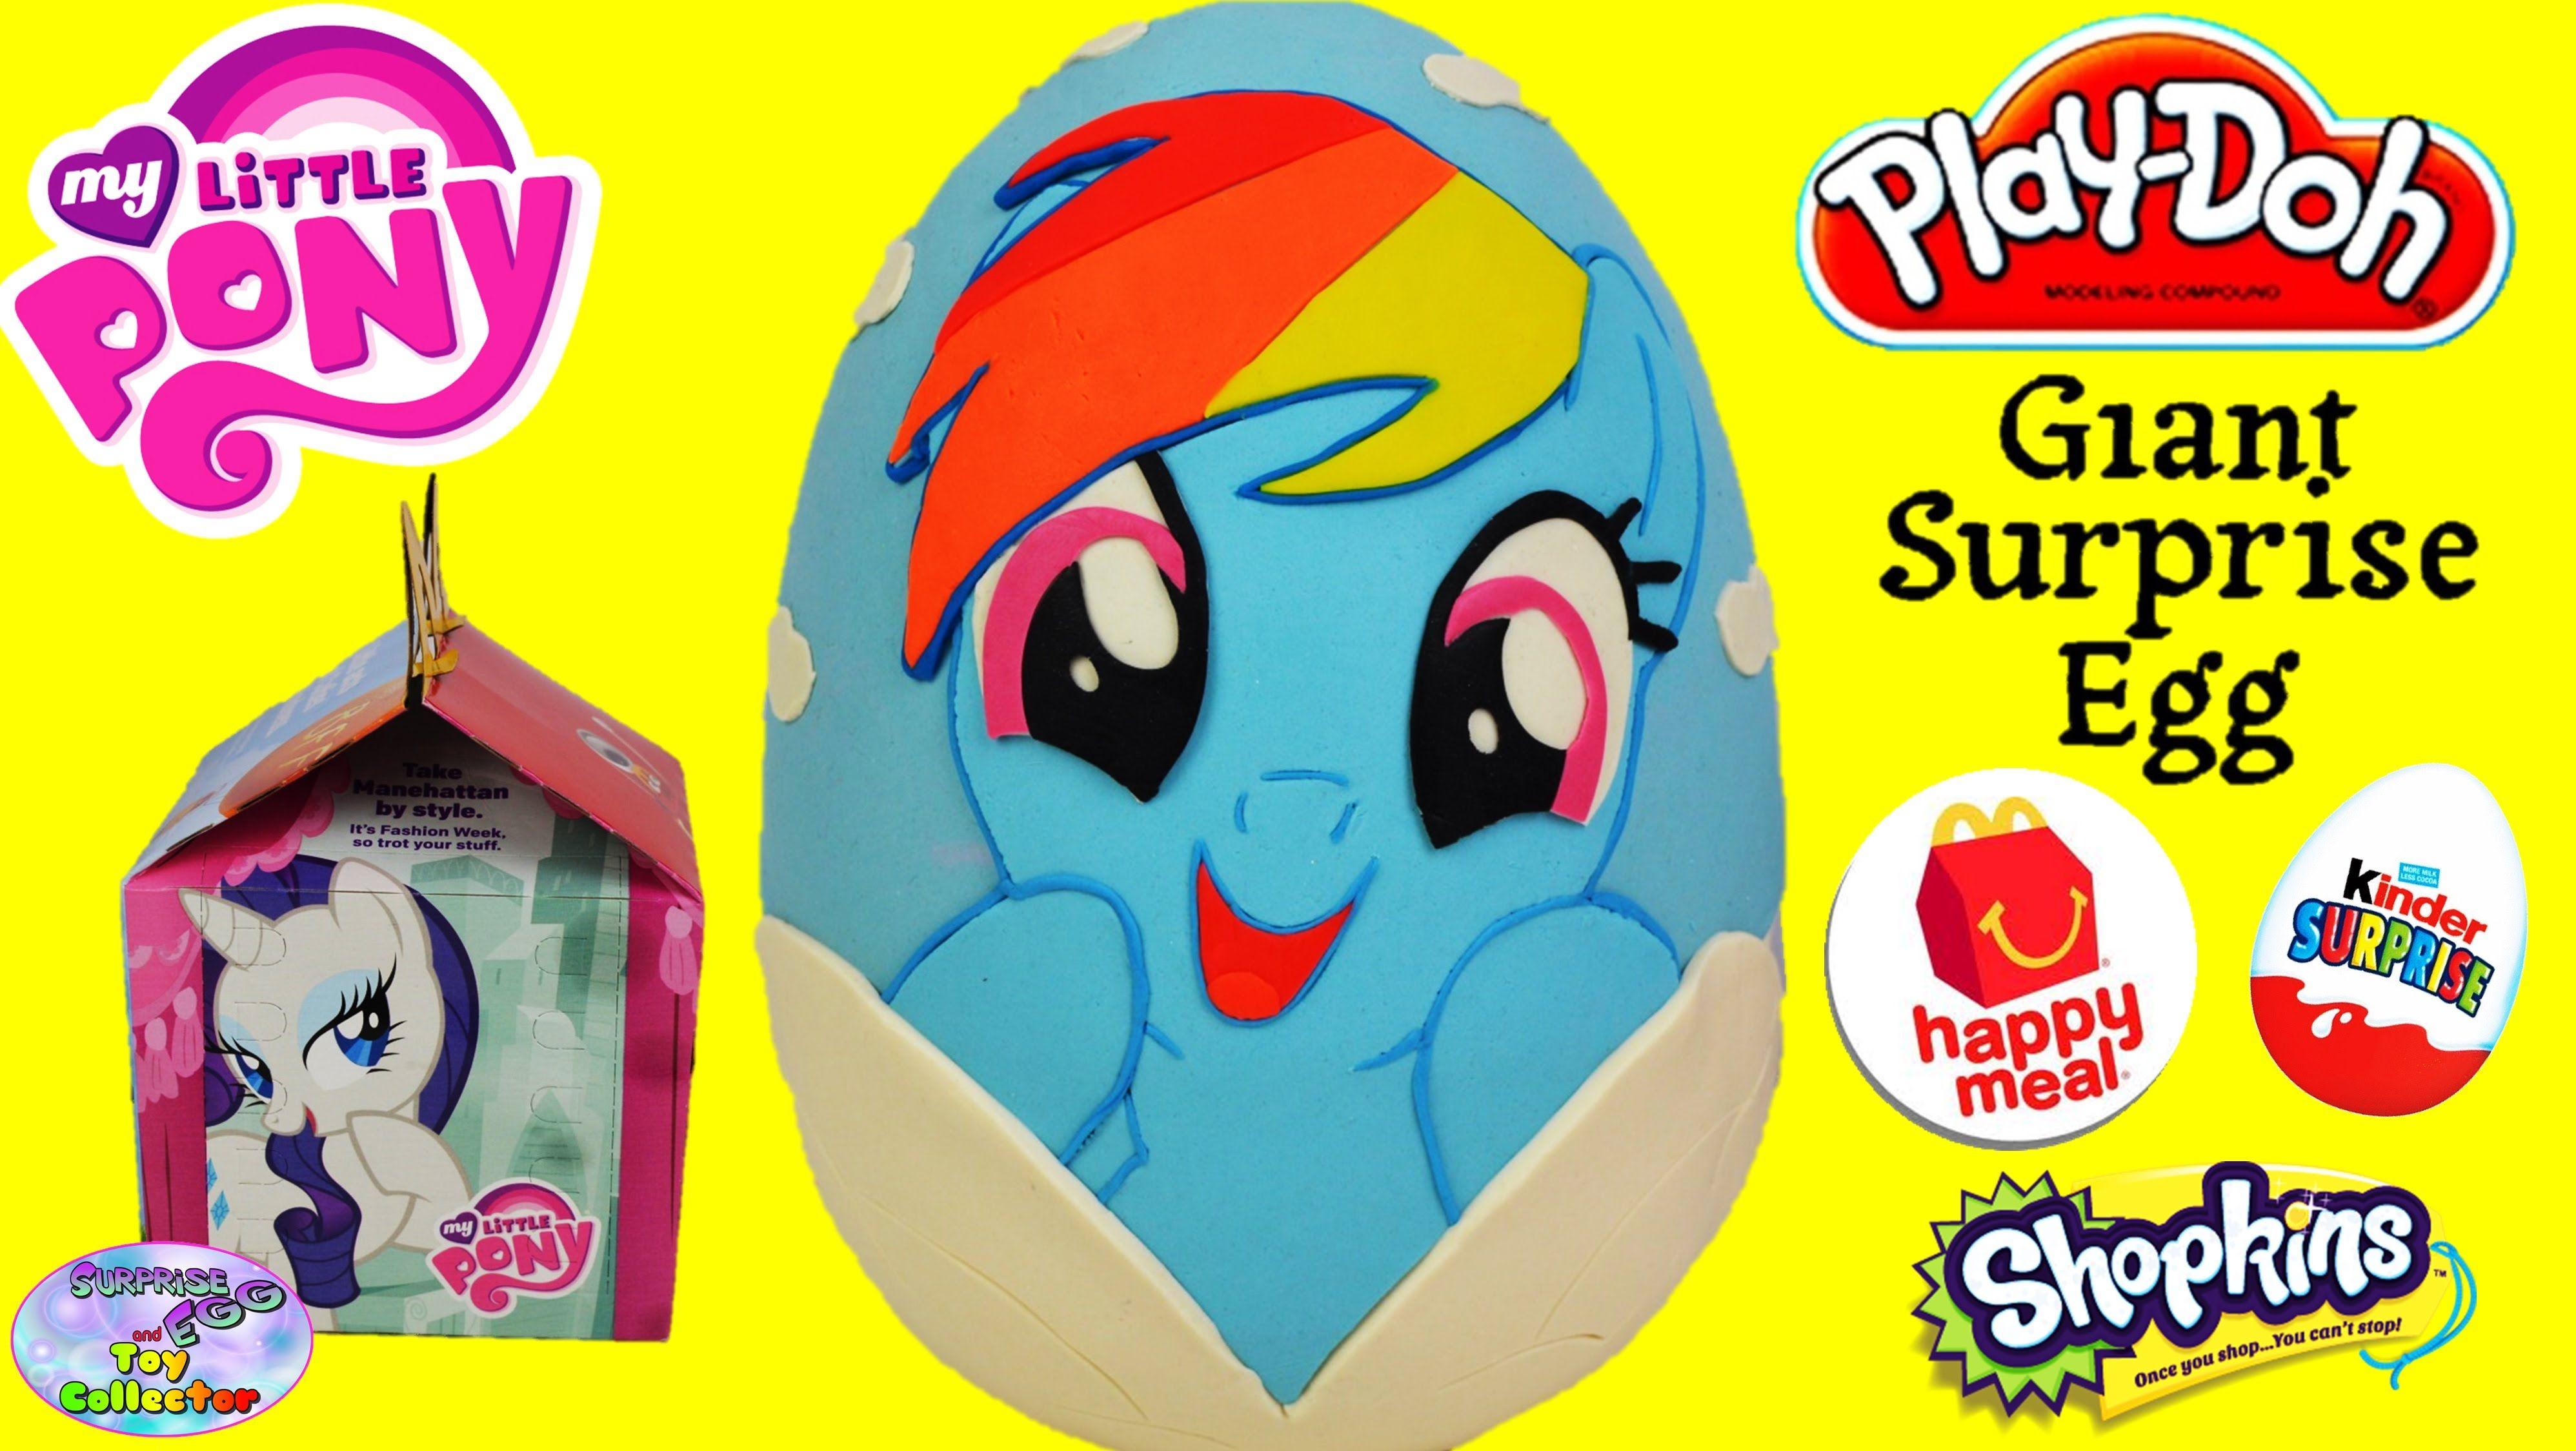 2f8d7b1db My Little Pony Giant Play Doh Surprise Egg Rainbow Dash McDonalds Happy .